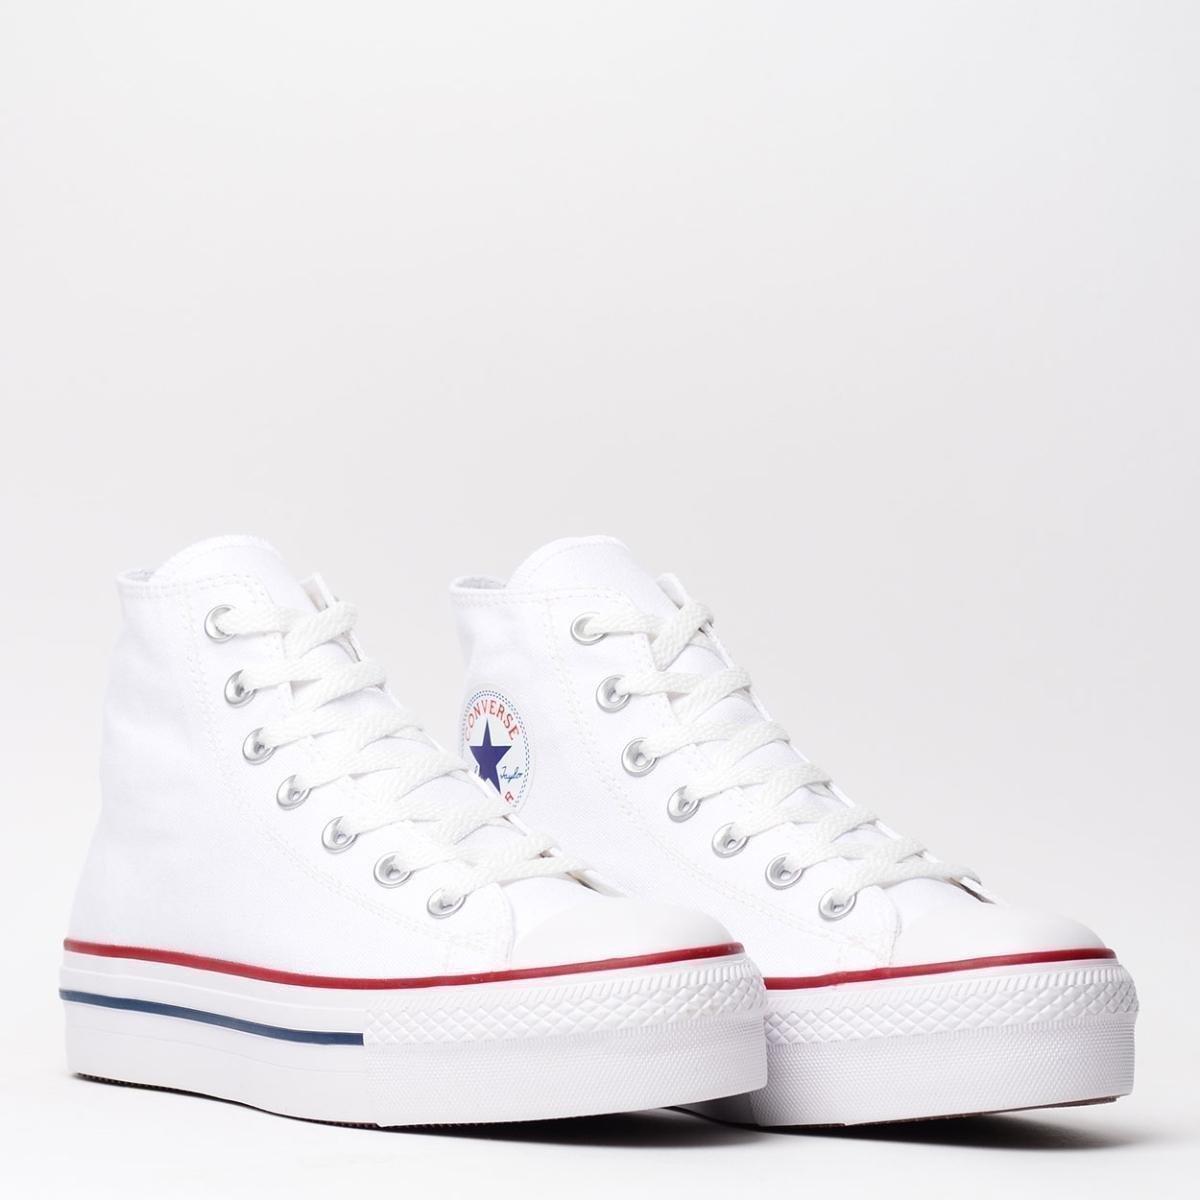 Tênis Converse Chuck Taylor All Star Platform Hi - Compre Agora ... 062a535f0590c